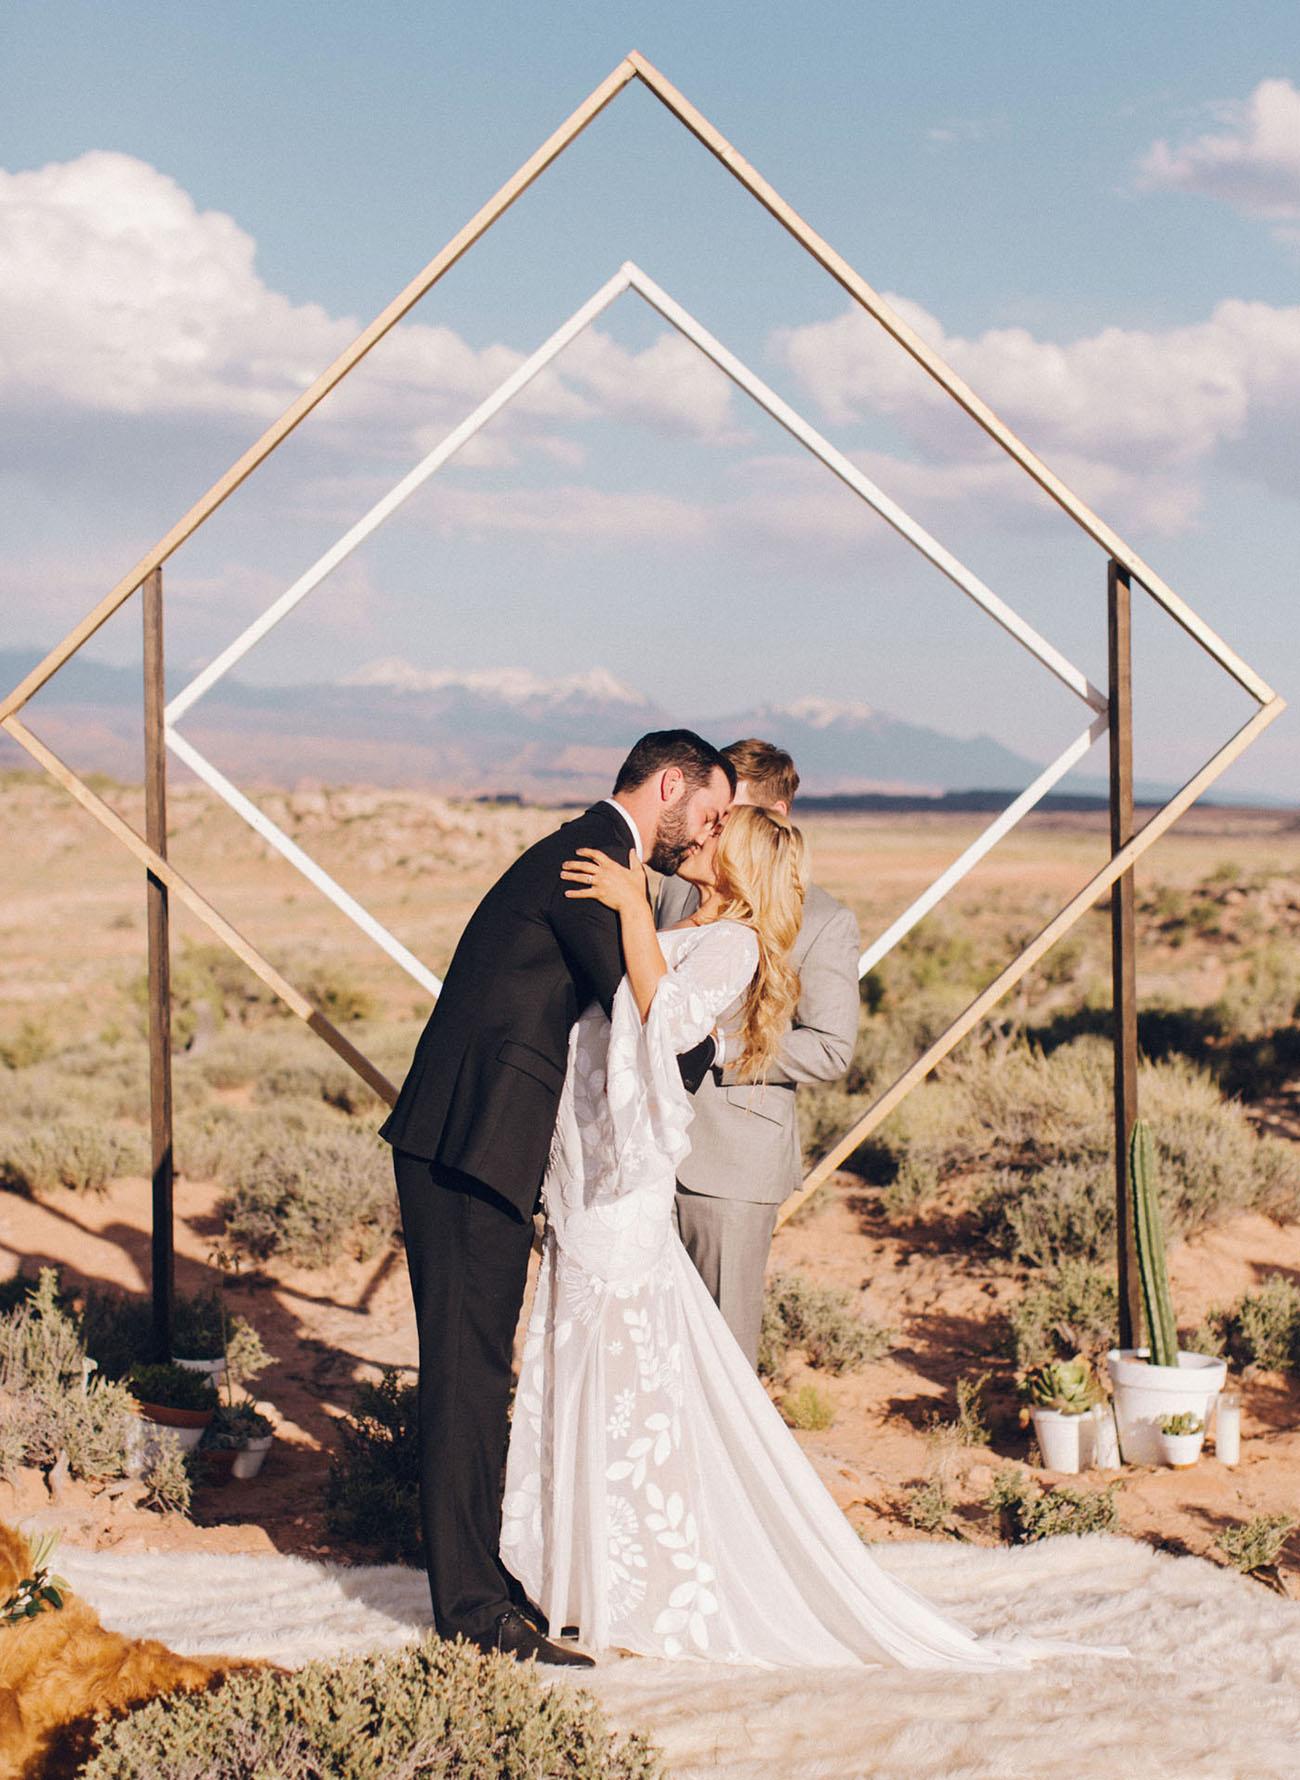 Weddingchella Desert Wedding